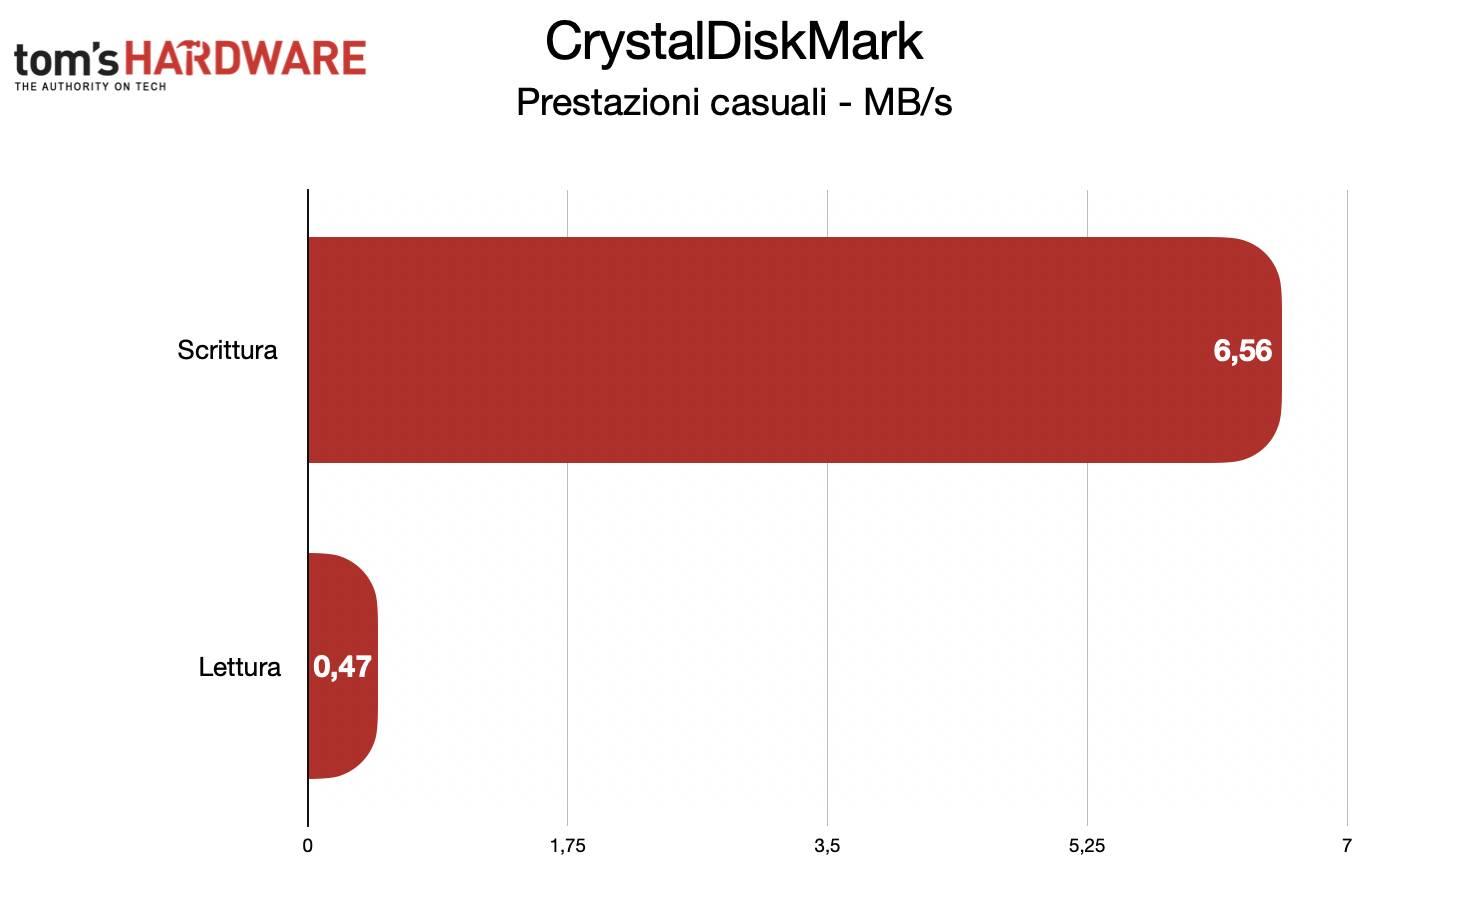 Benchmark Toshiba Canvio Gaming - CrystalDiskMark casuali